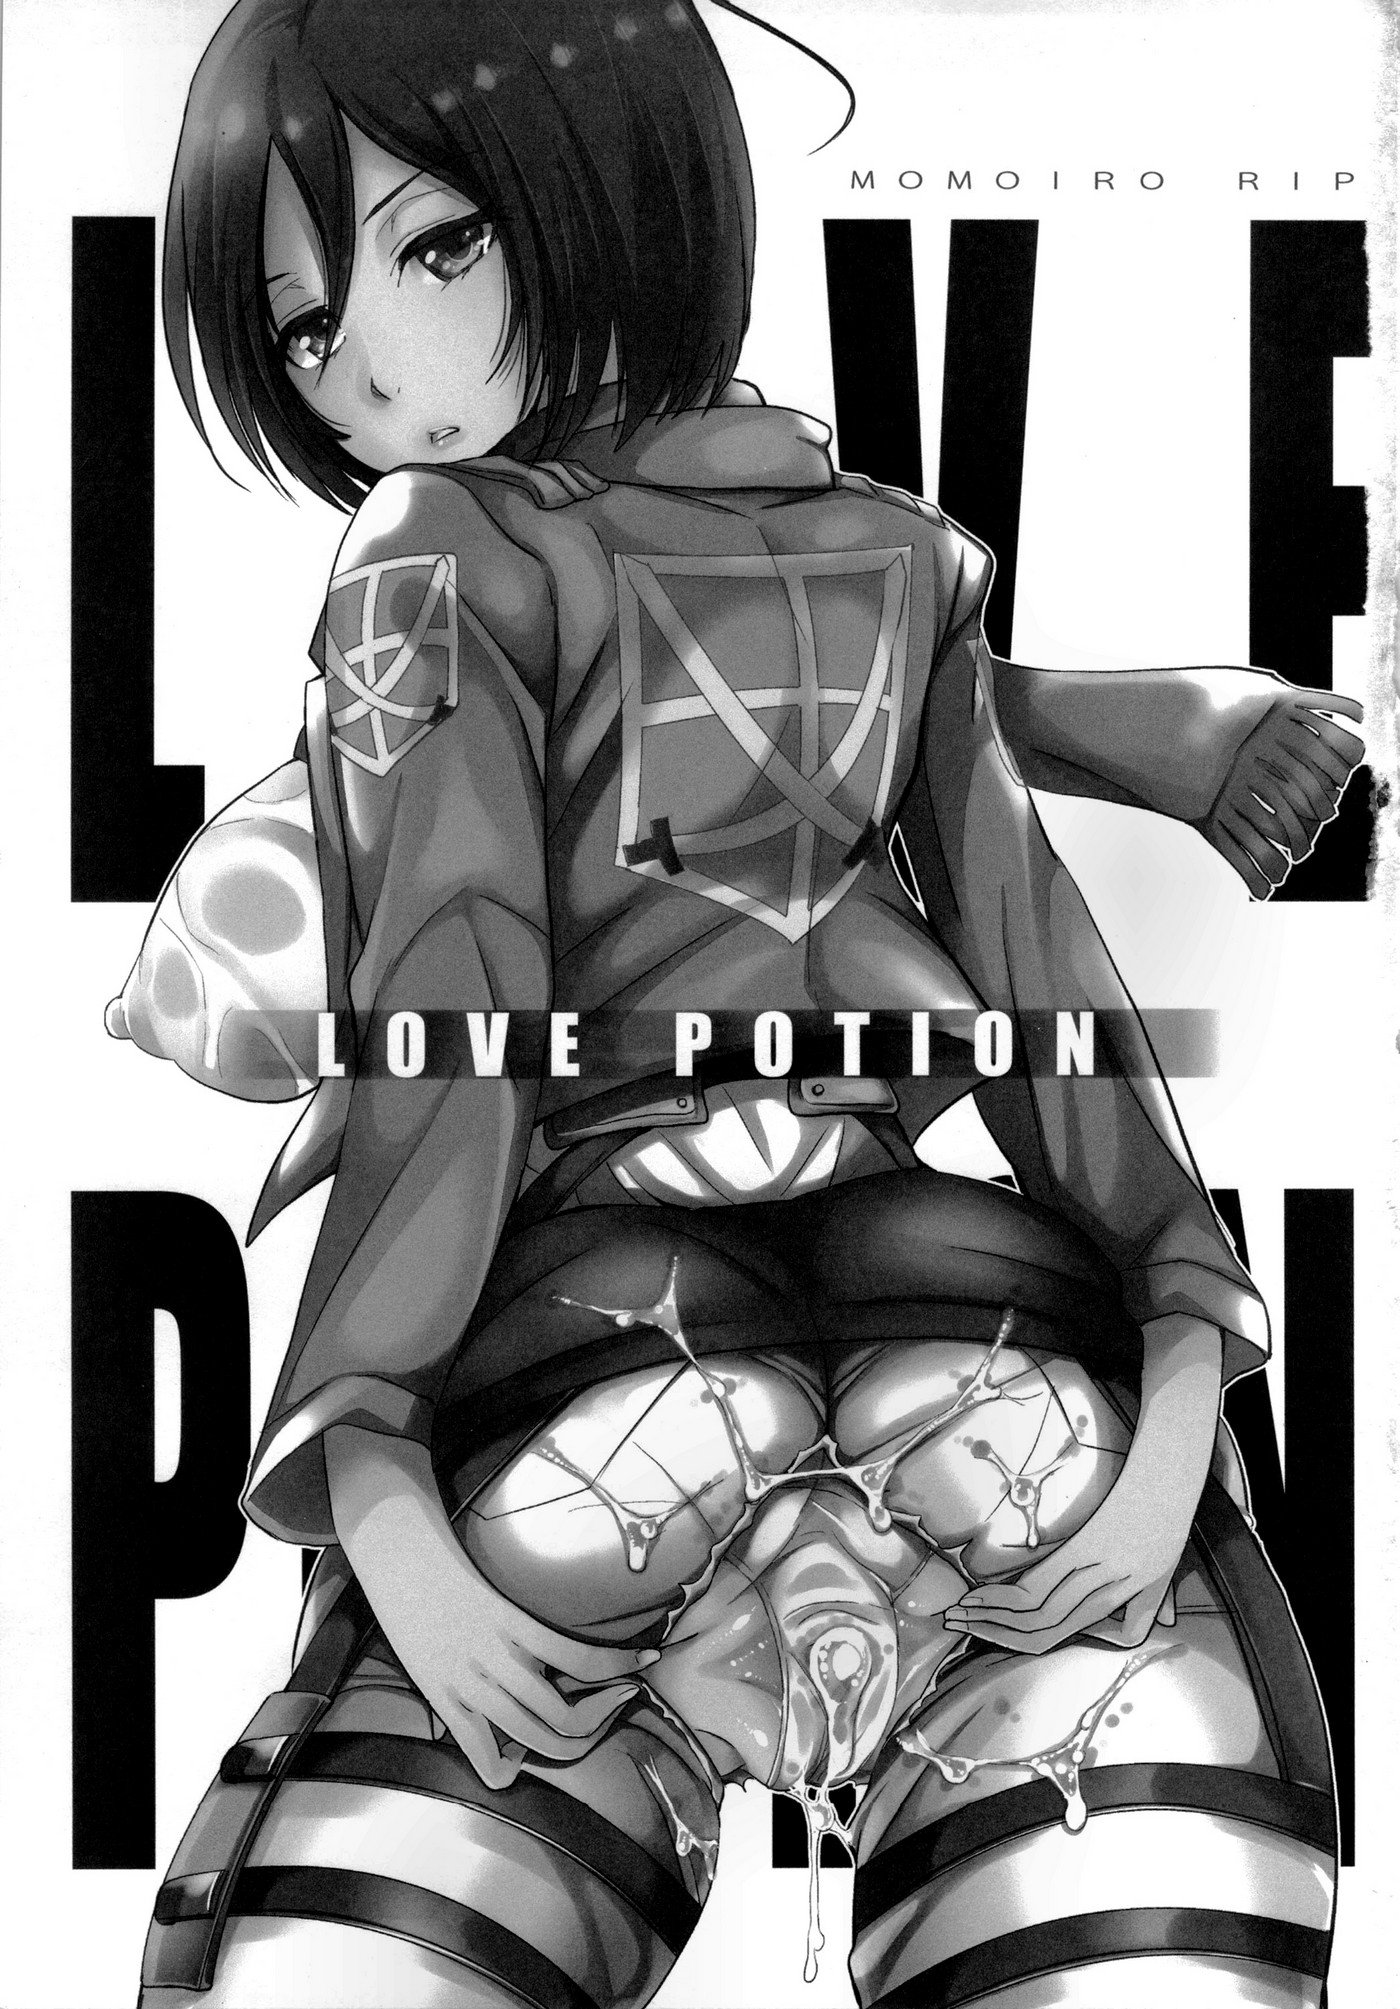 Momoiro Rip Love Potion 02